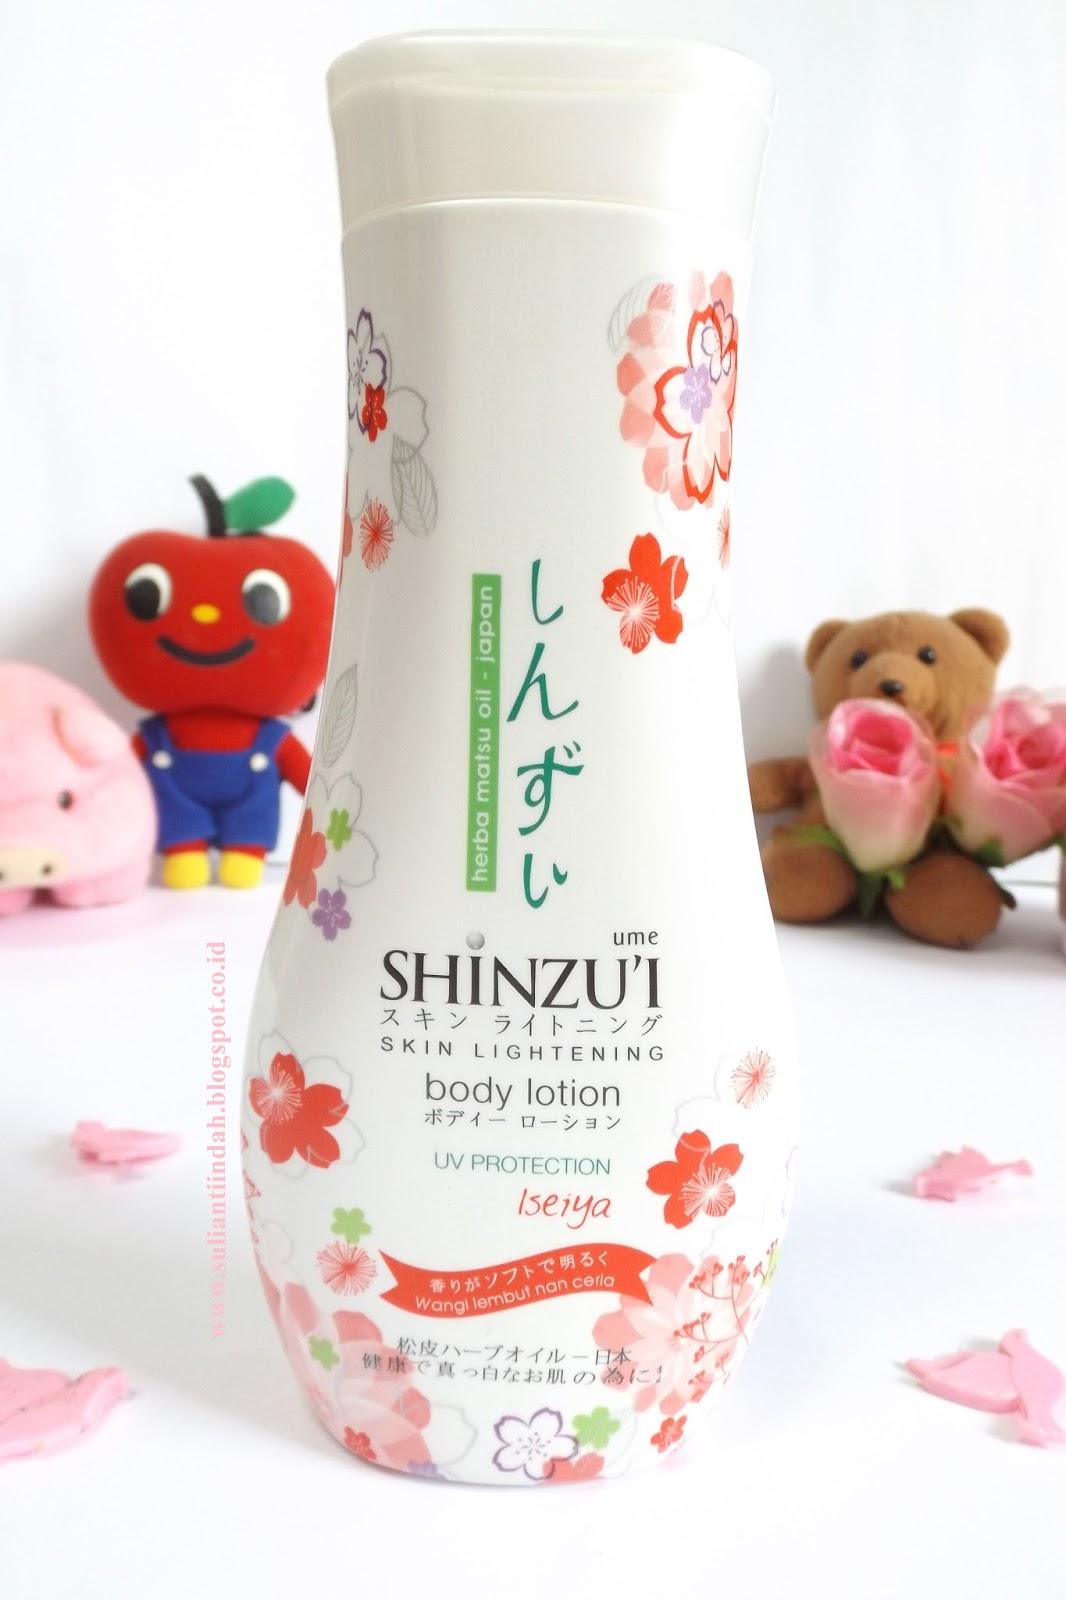 Before After My Beauty Secrets Shinzui Ume Body Scrub Adzuki Sabun Batang Lotion Uv Protection Iseiya